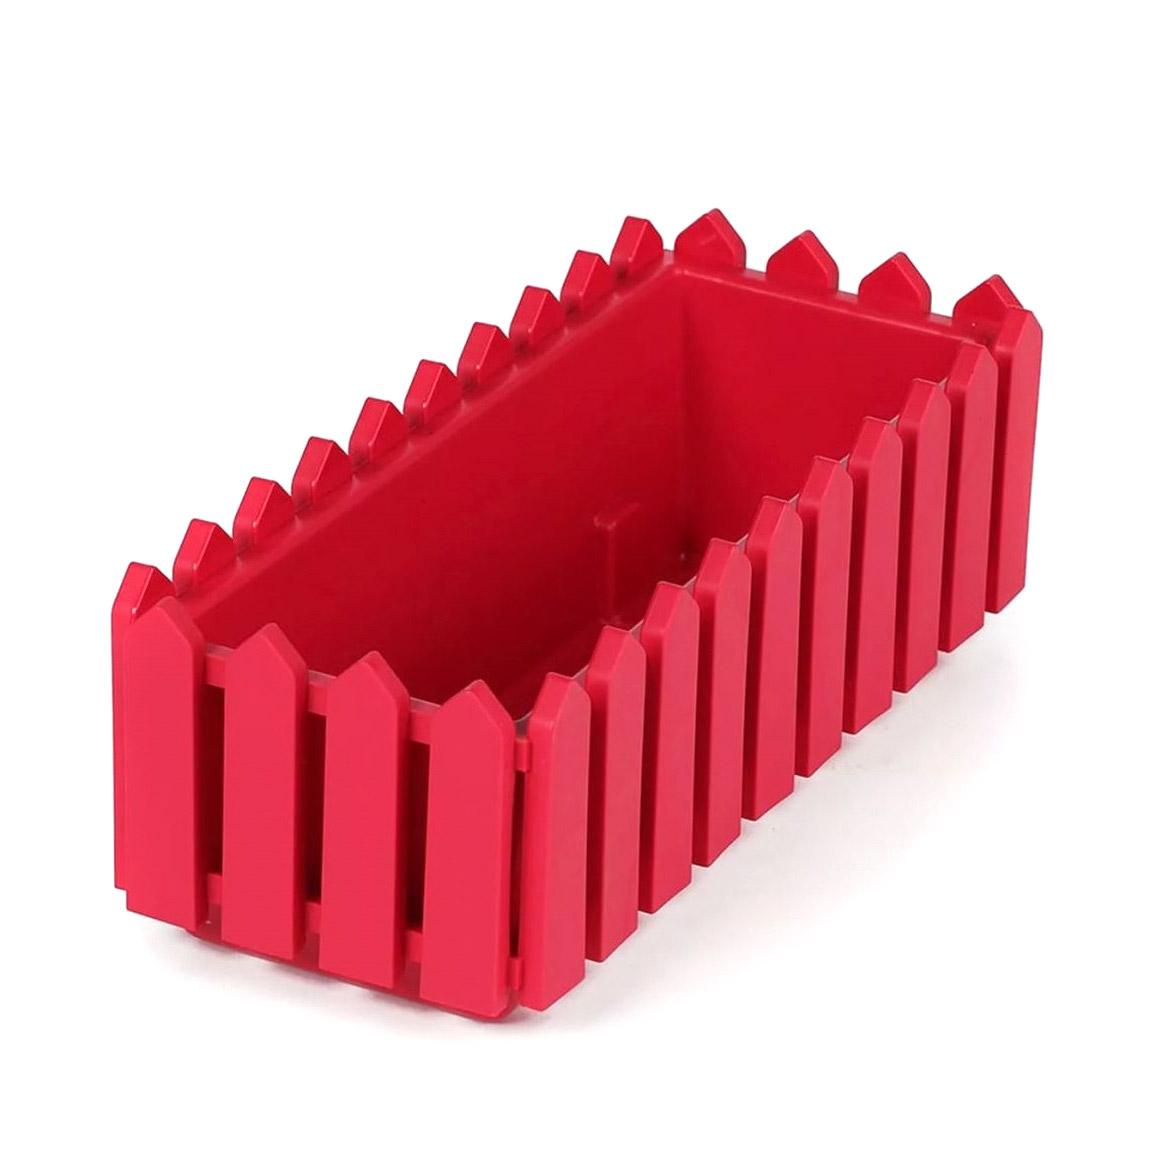 Ящик Элластик-пласт Лардо с поддоном Красн 47х19.2х16 см фото